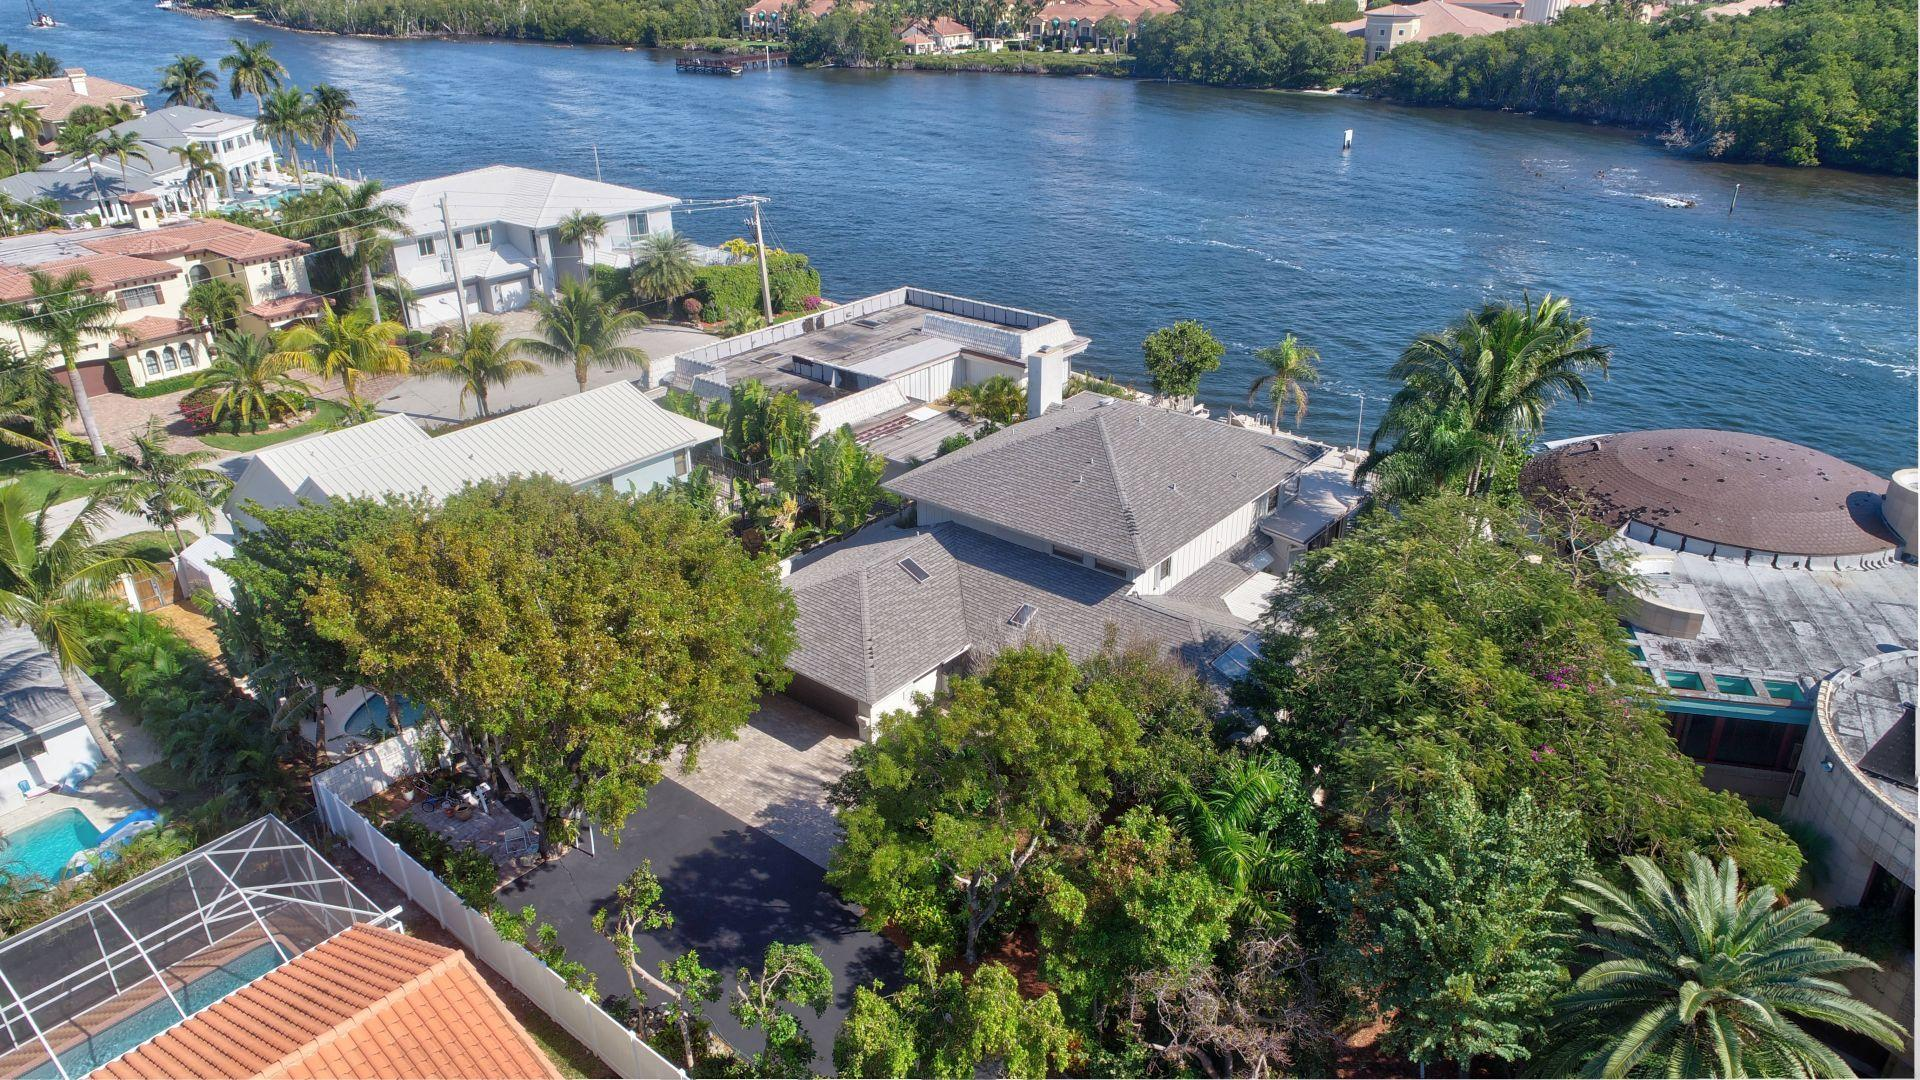 879 Berkeley Street, Boca Raton, Florida 33487, 4 Bedrooms Bedrooms, ,3.1 BathroomsBathrooms,Single Family,For Sale,Berkeley,RX-10498280